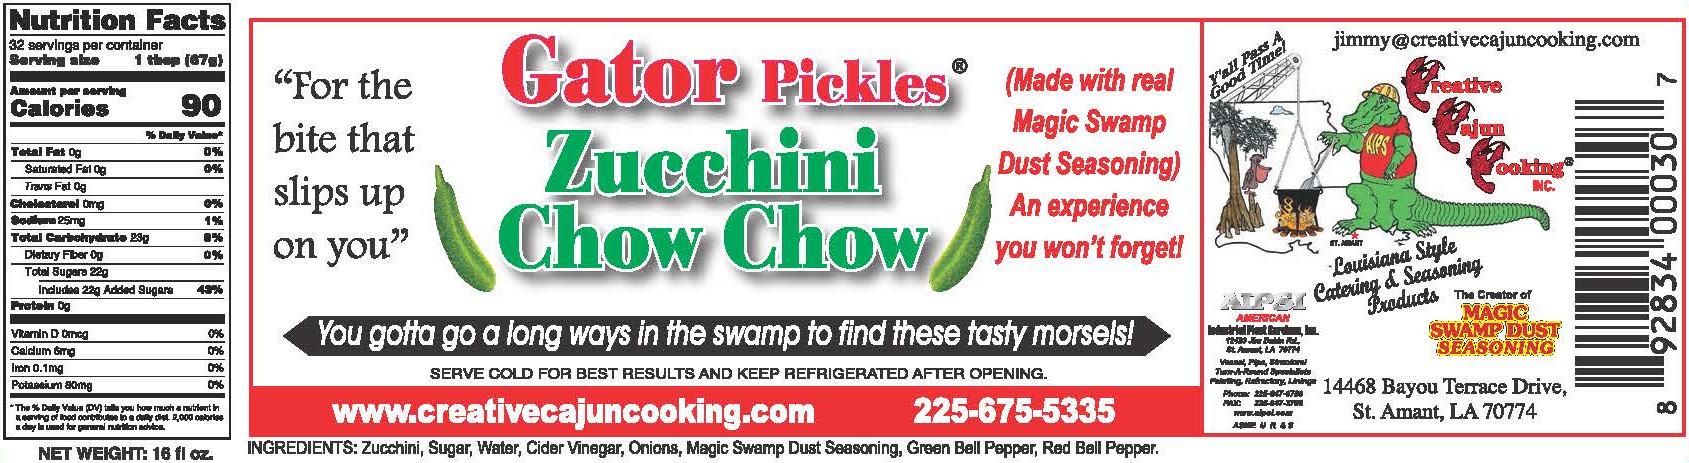 zucchini-chow-chow.jpg